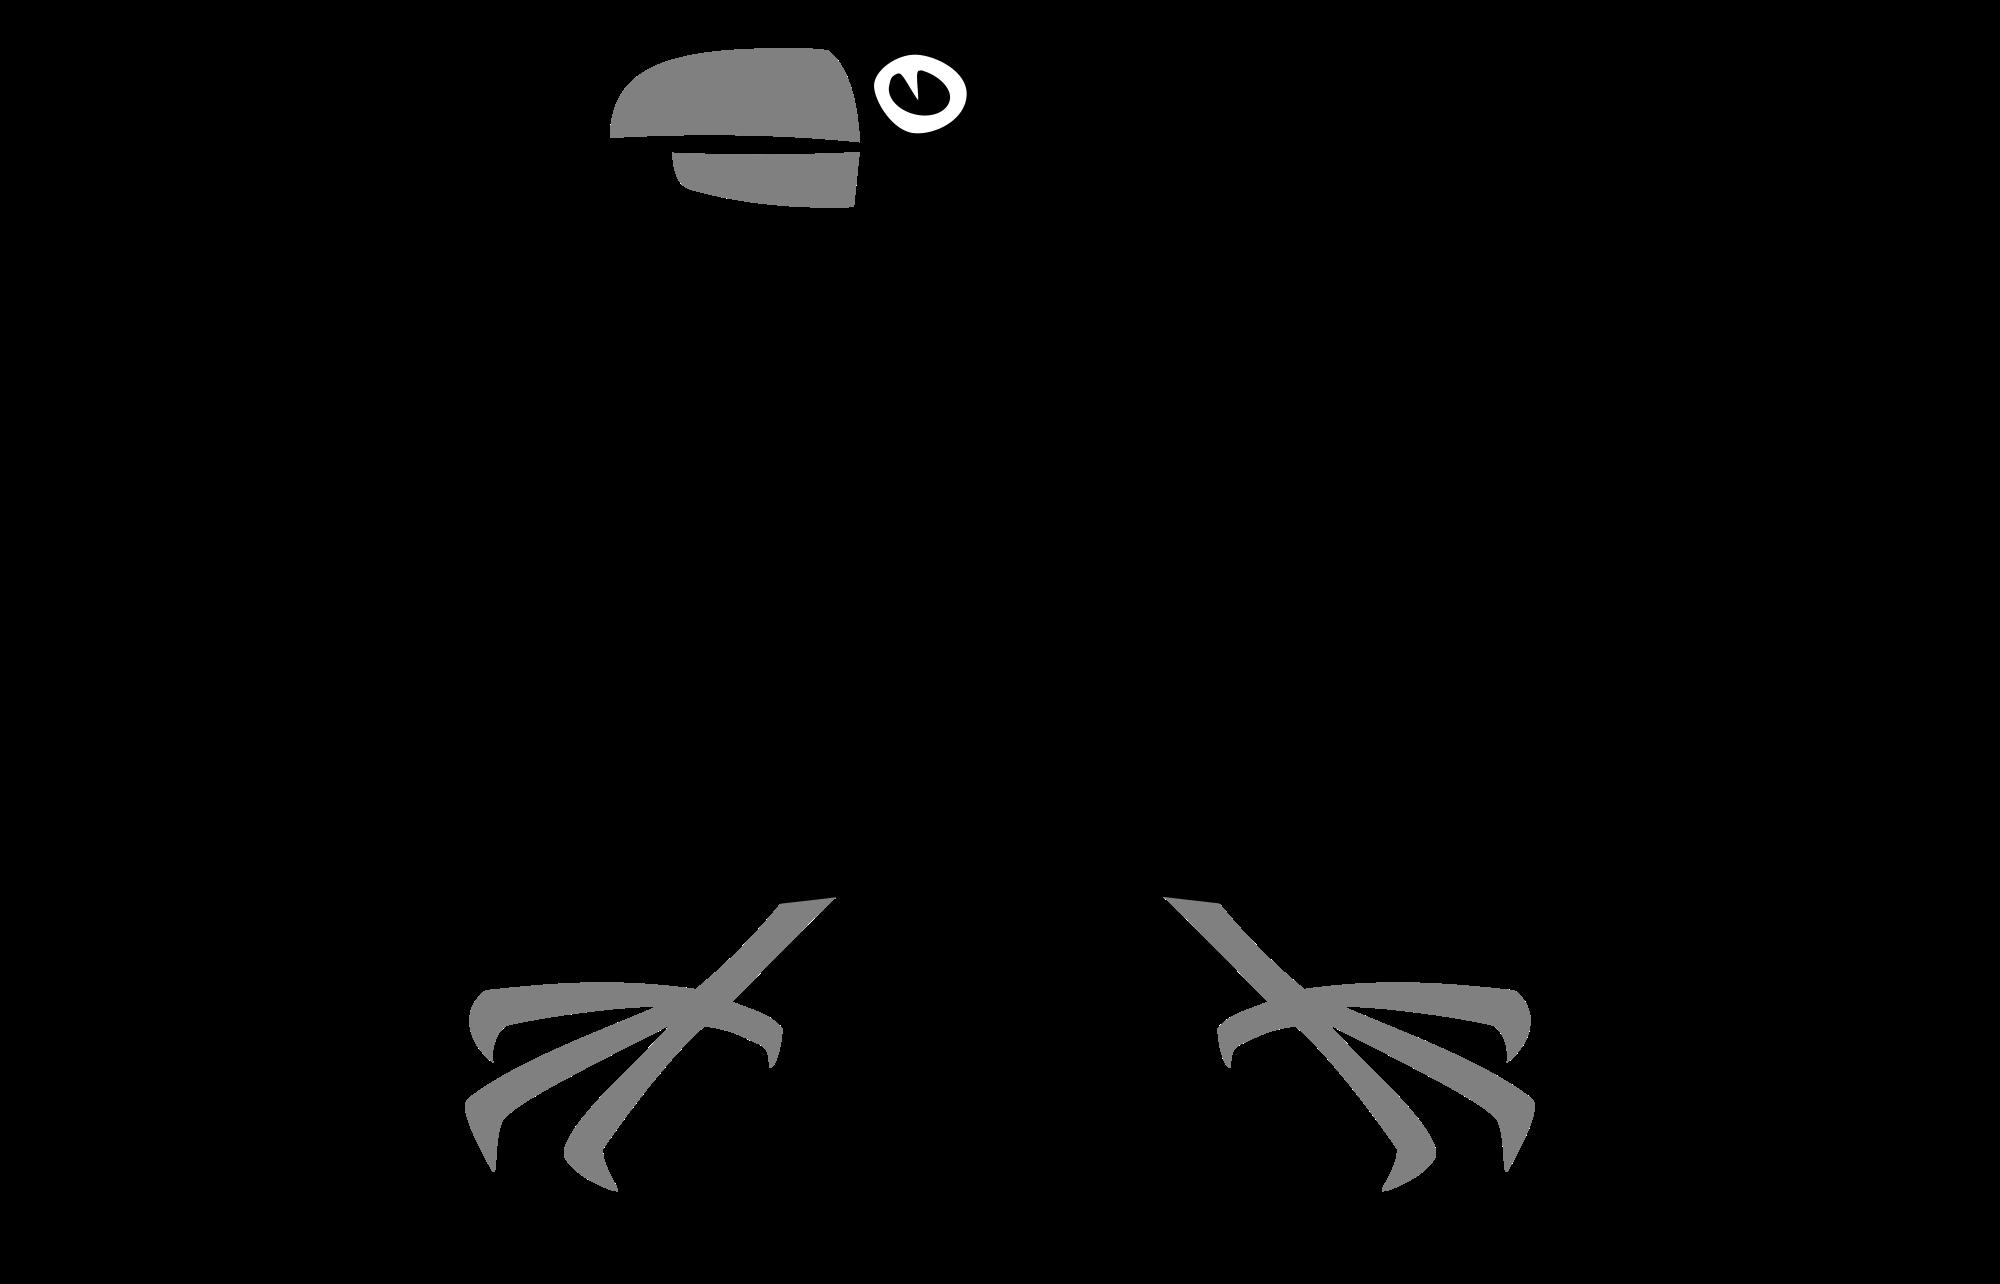 Crow clipart svg. File heraldic wikimedia commons